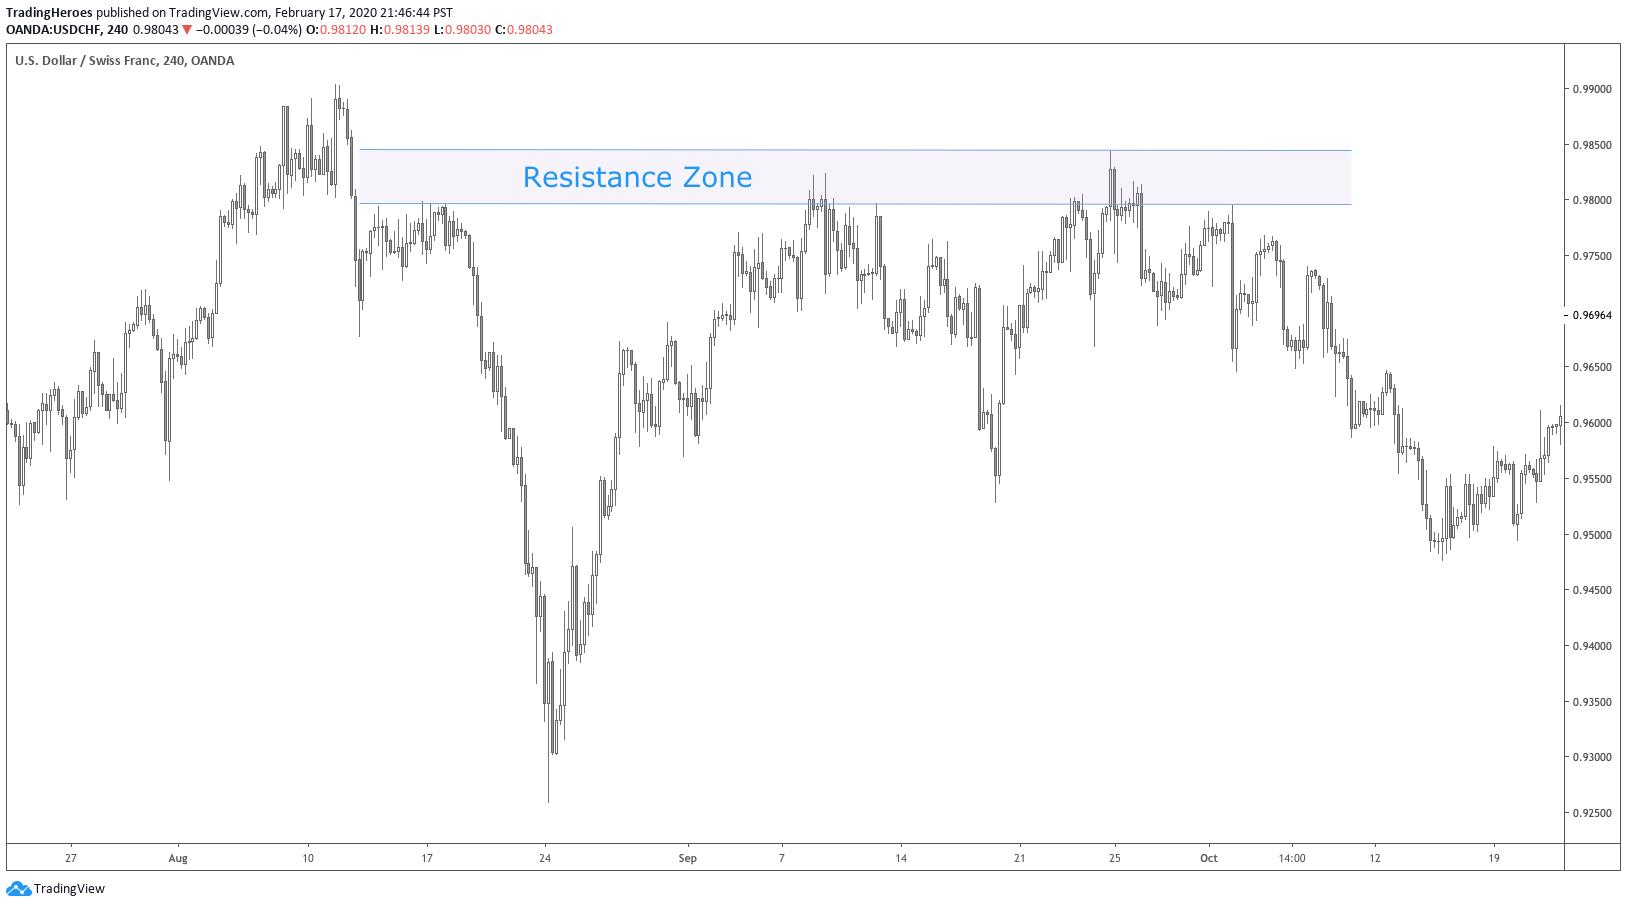 Resistance zone